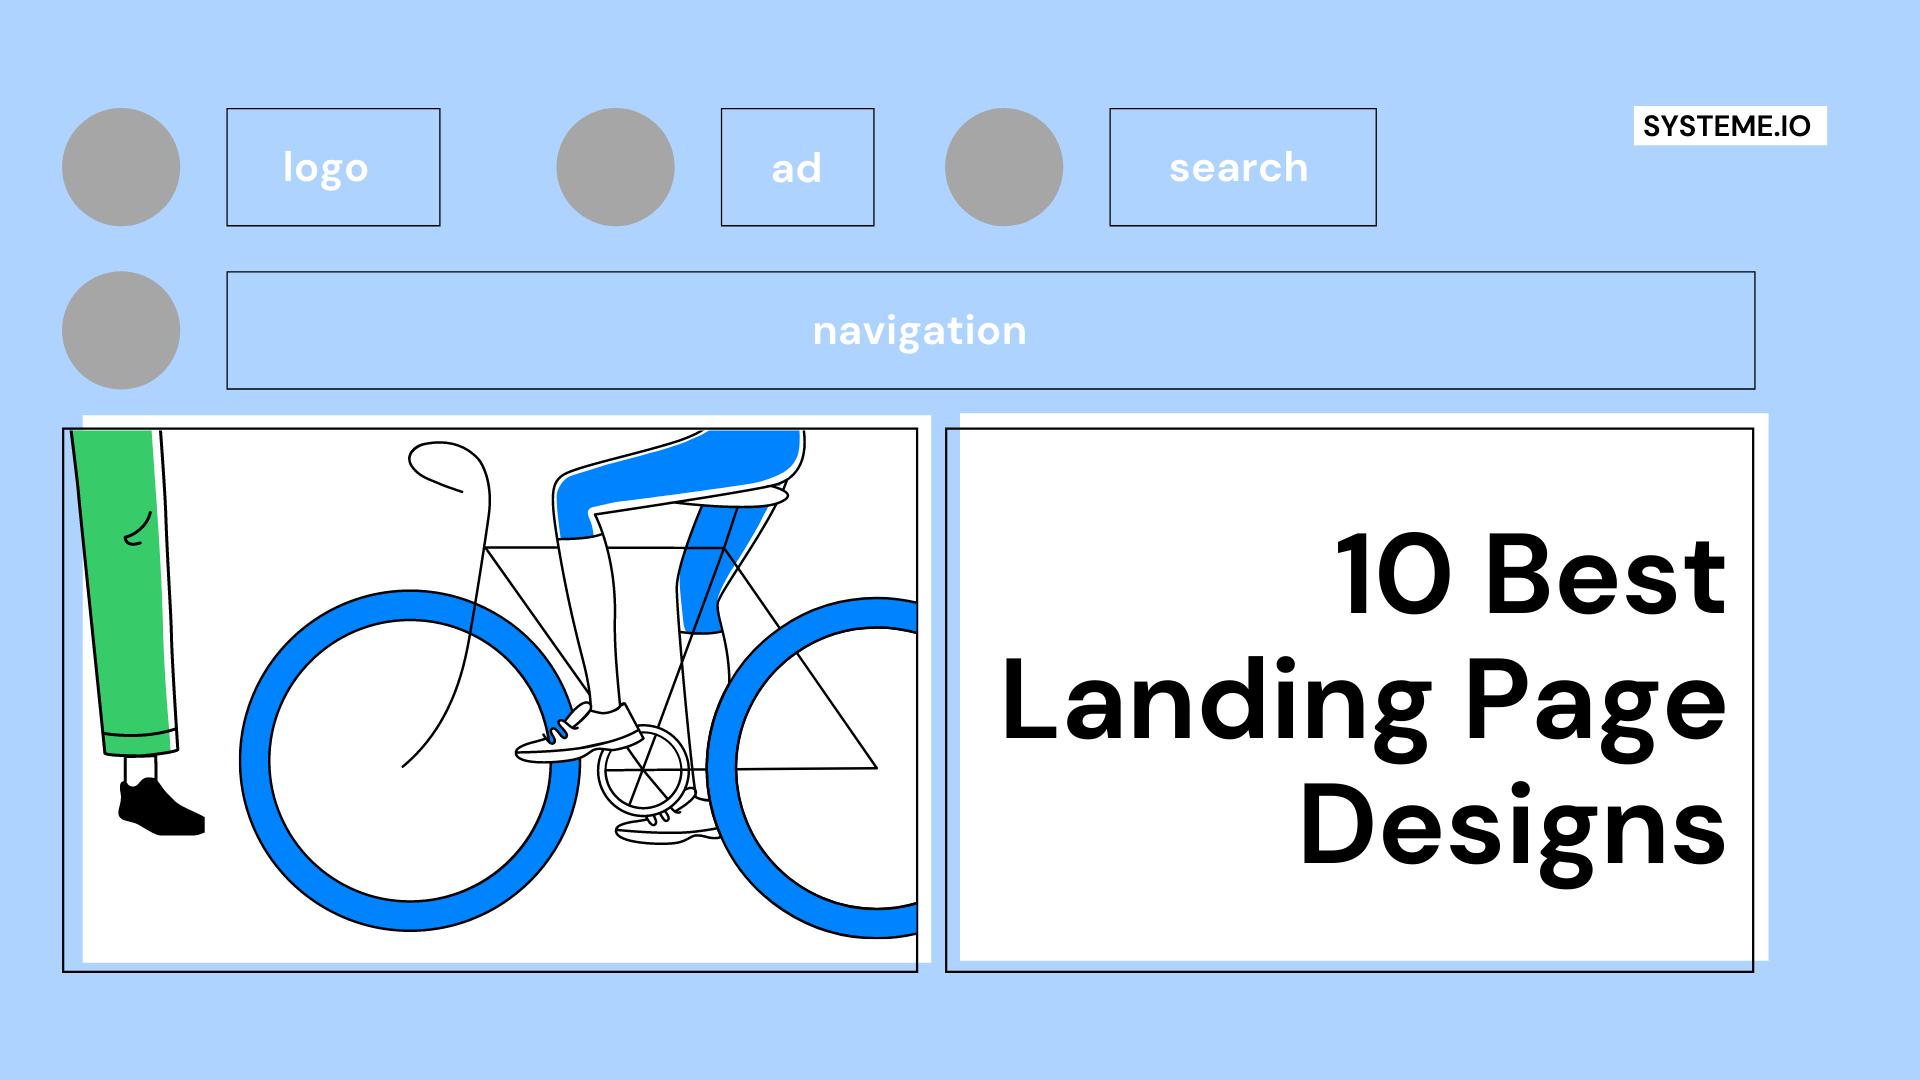 Top 10 Landing Page Designs